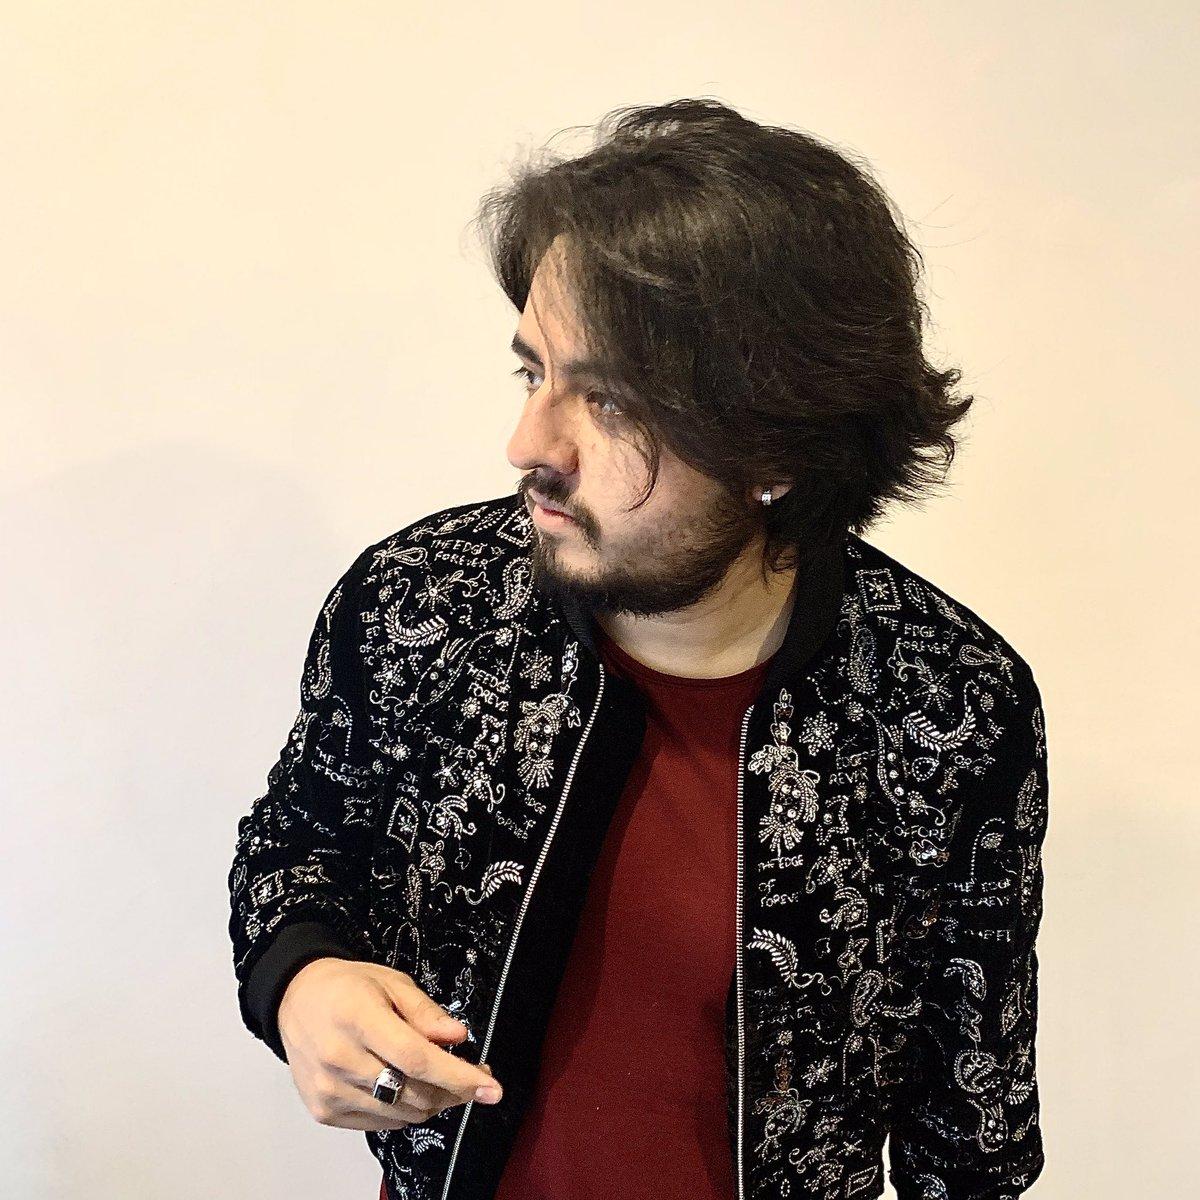 🔙🔙 #Rock #2019ArtistWrapped #2020NewYear #NewMusic #Spotify #Music #Mexico #fashion #Drummer #Birthday #Piscis #18Feb #BEARD